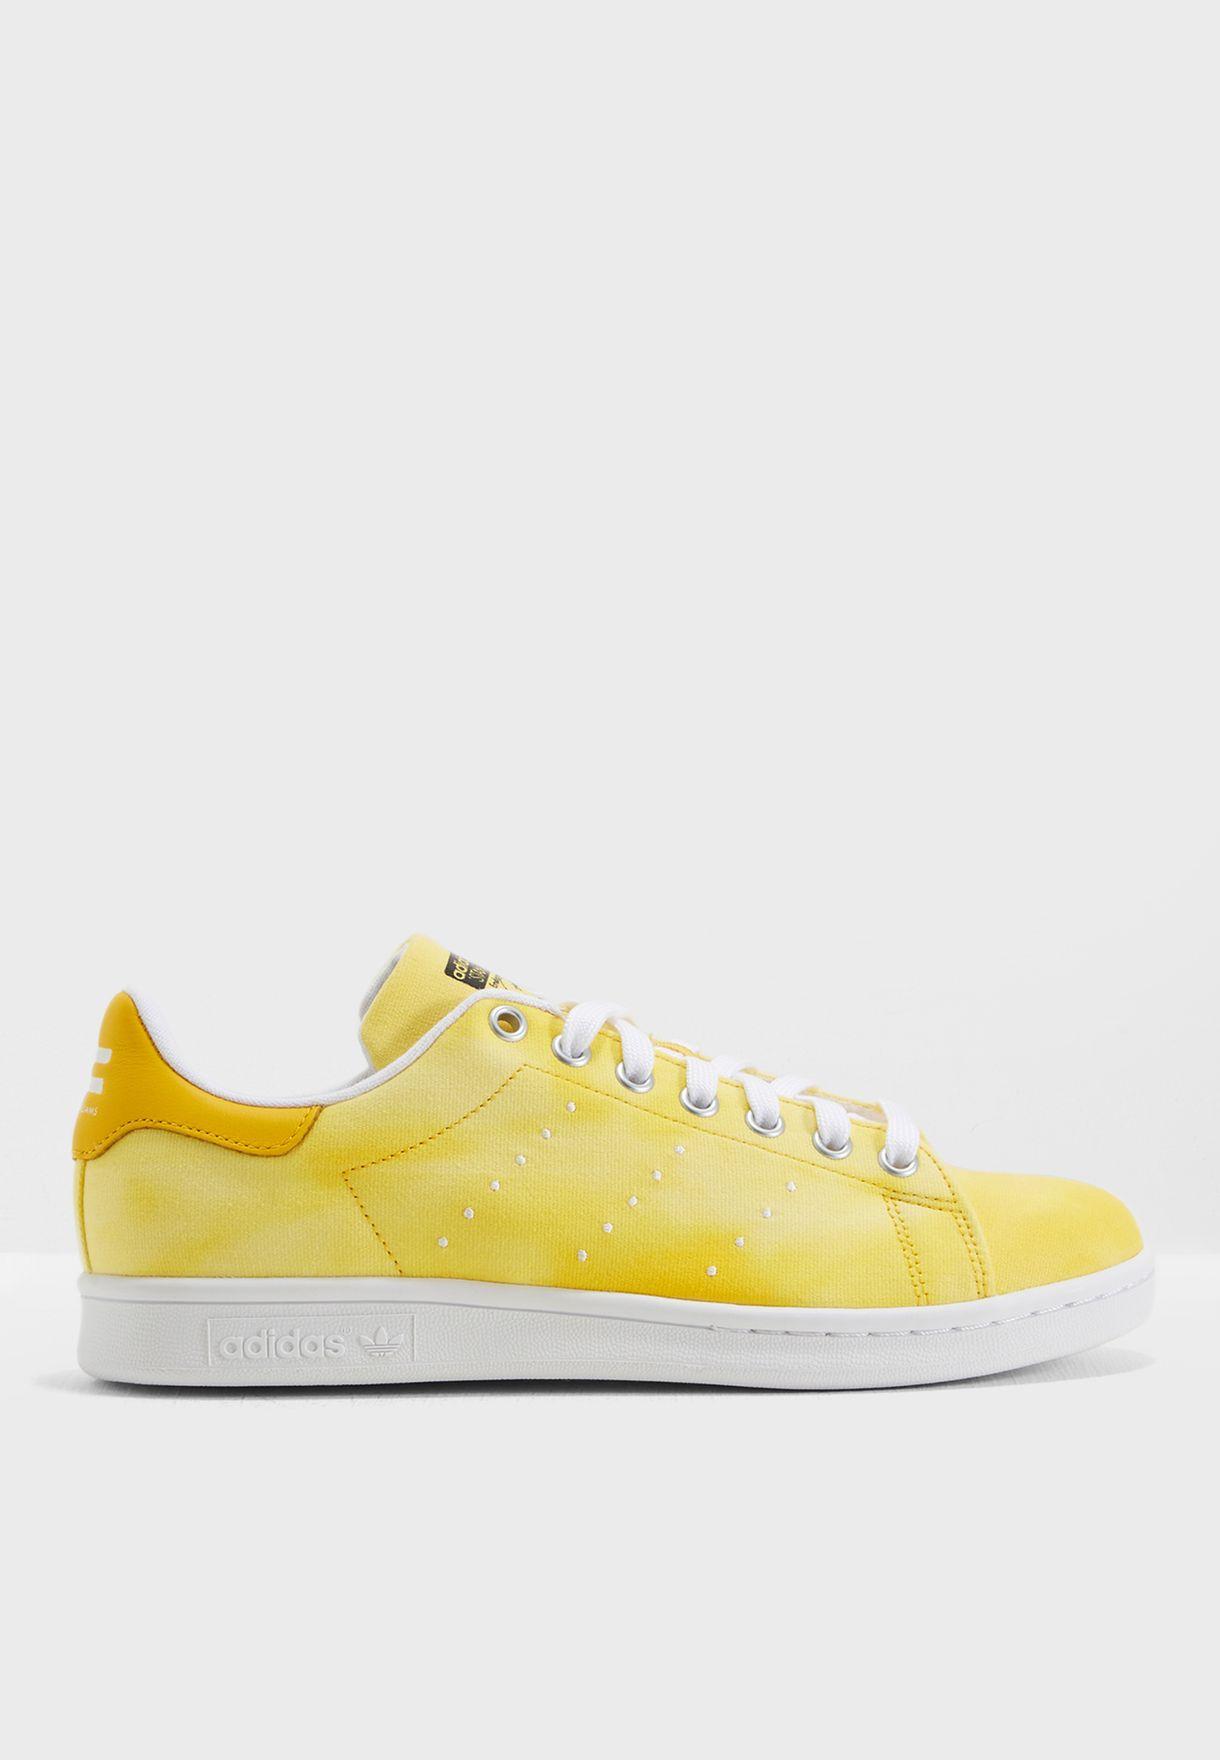 9951e7f42 Shop adidas Originals yellow Pharrell Williams Hu Holi Stan Smith ...